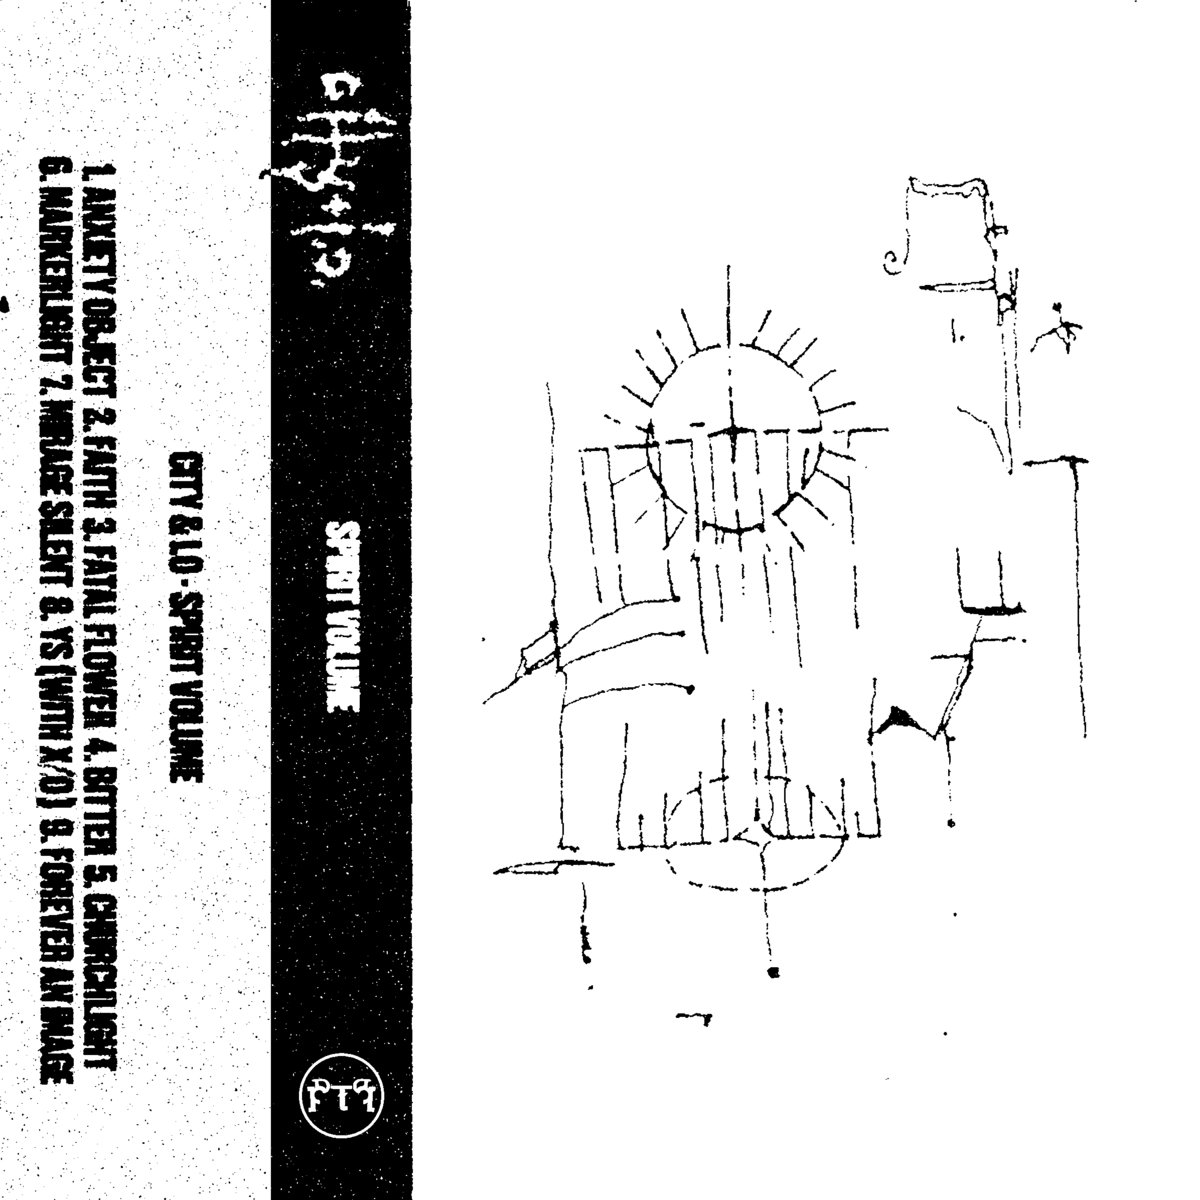 Chronicles of A Broken Spirit-Volume II